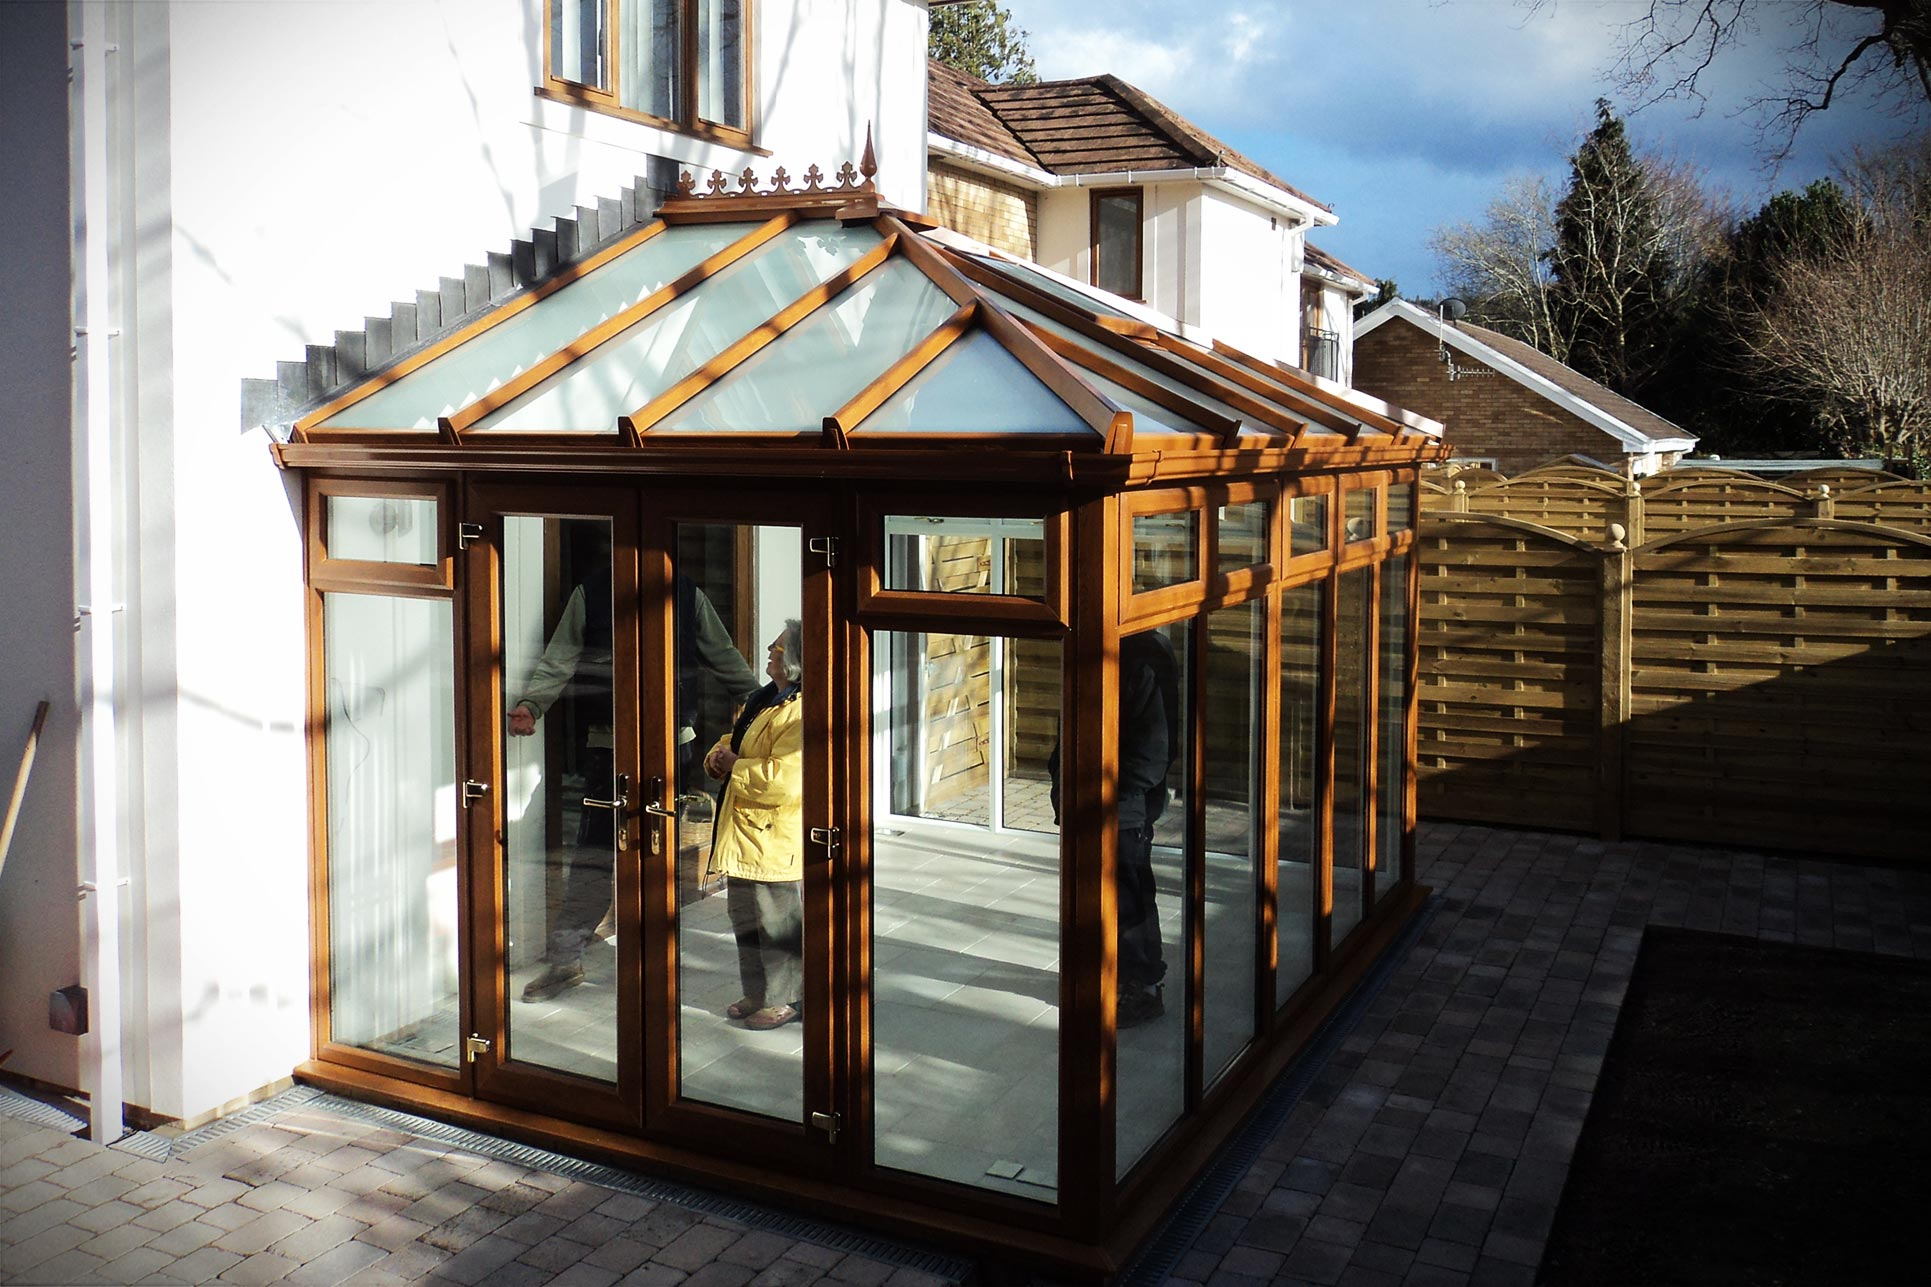 Golden oak effect Edwardian uPVC conservatory